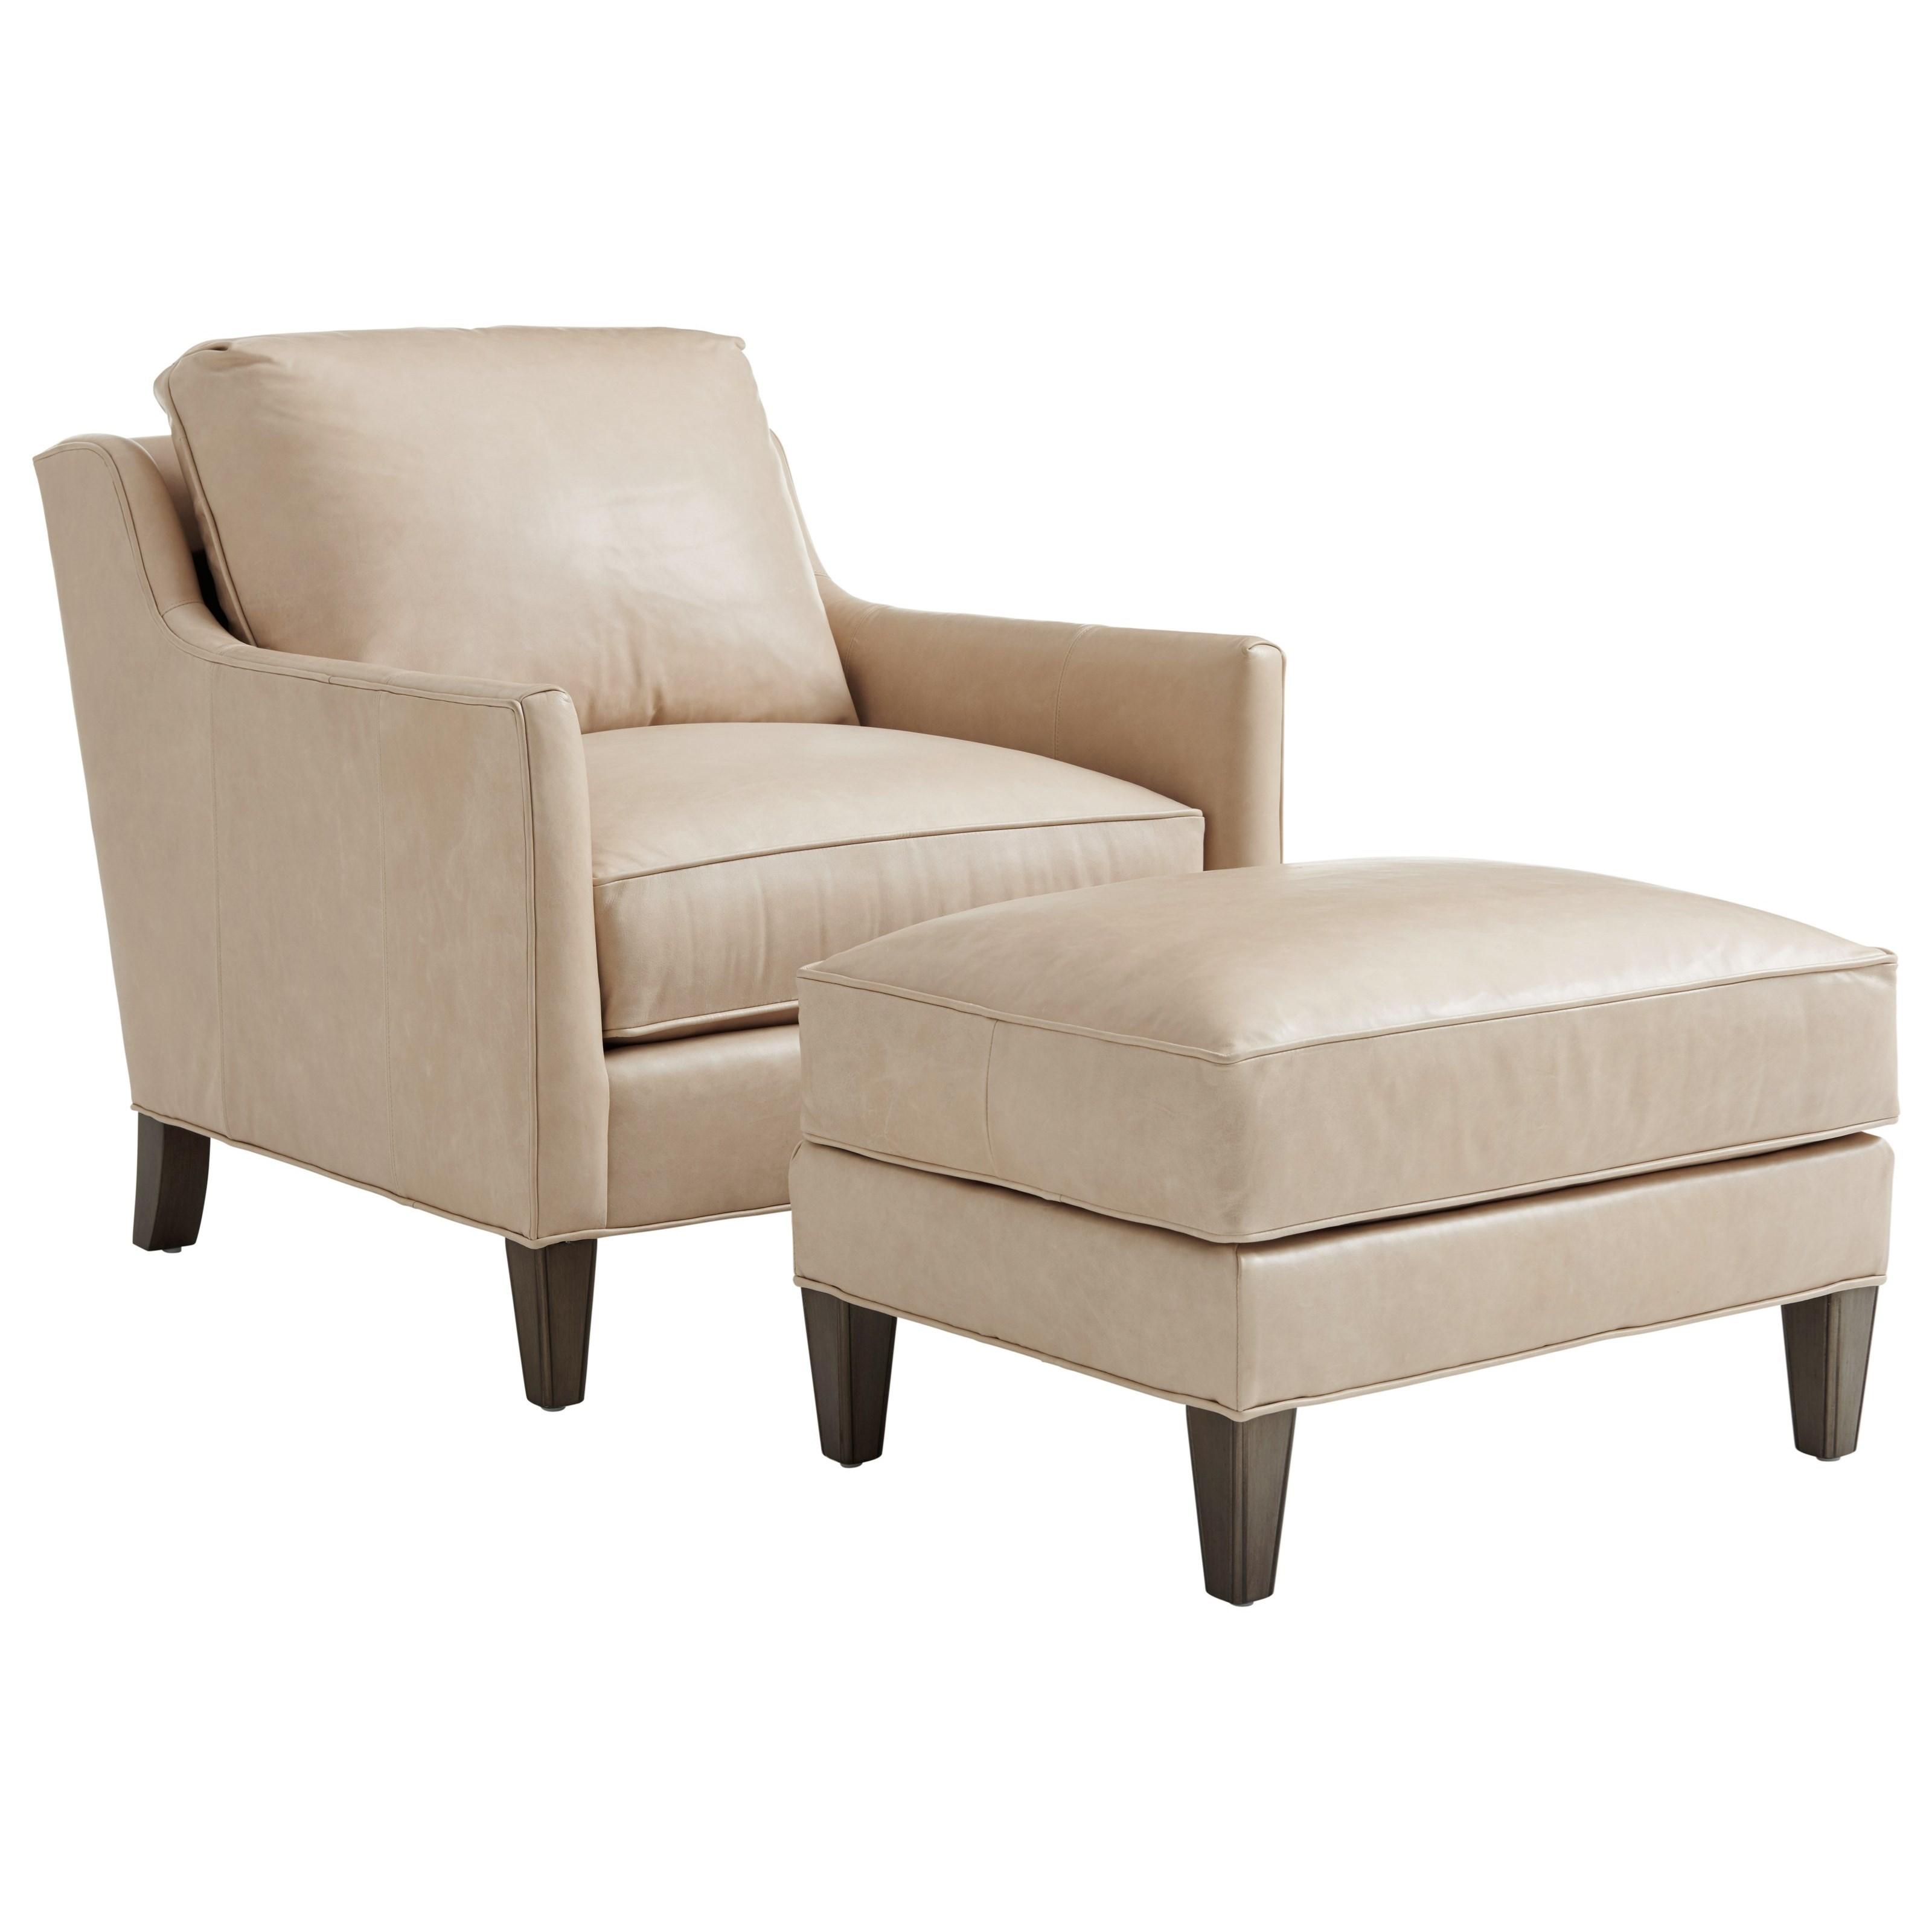 Lexington Ariana Turin Ottoman | Howell Furniture | Ottomans